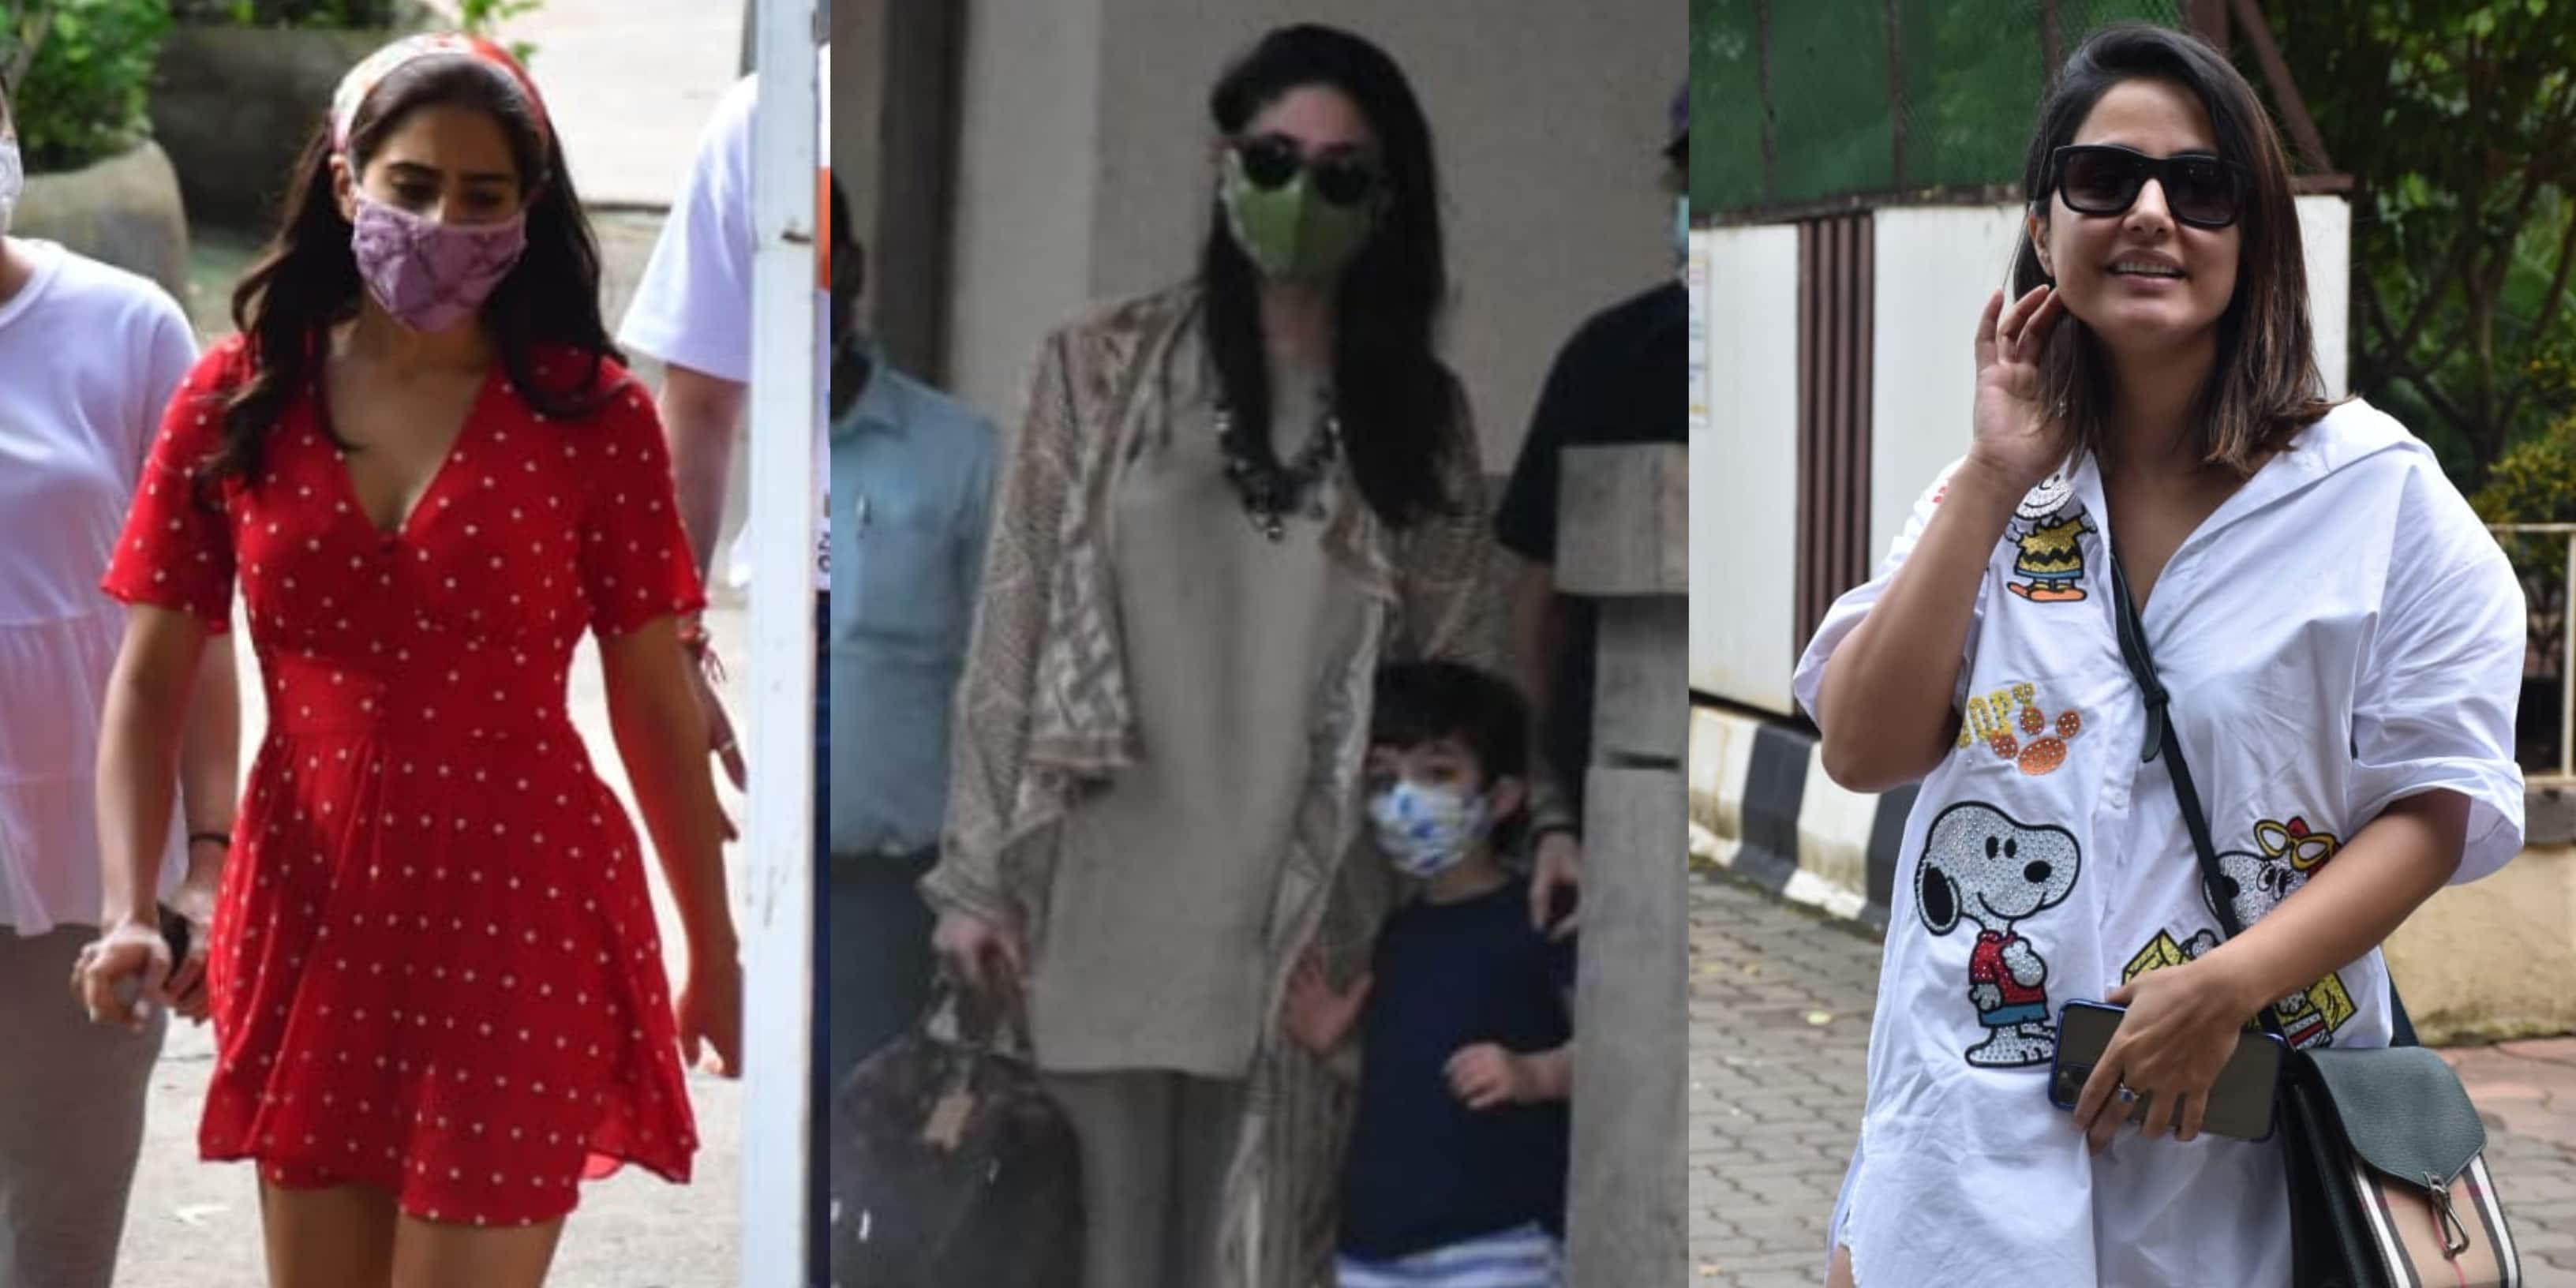 Spotted: Kareena Kapoor Khan Seen With Taimur, Sara Ali Khan Shoot At Mehboob Studios